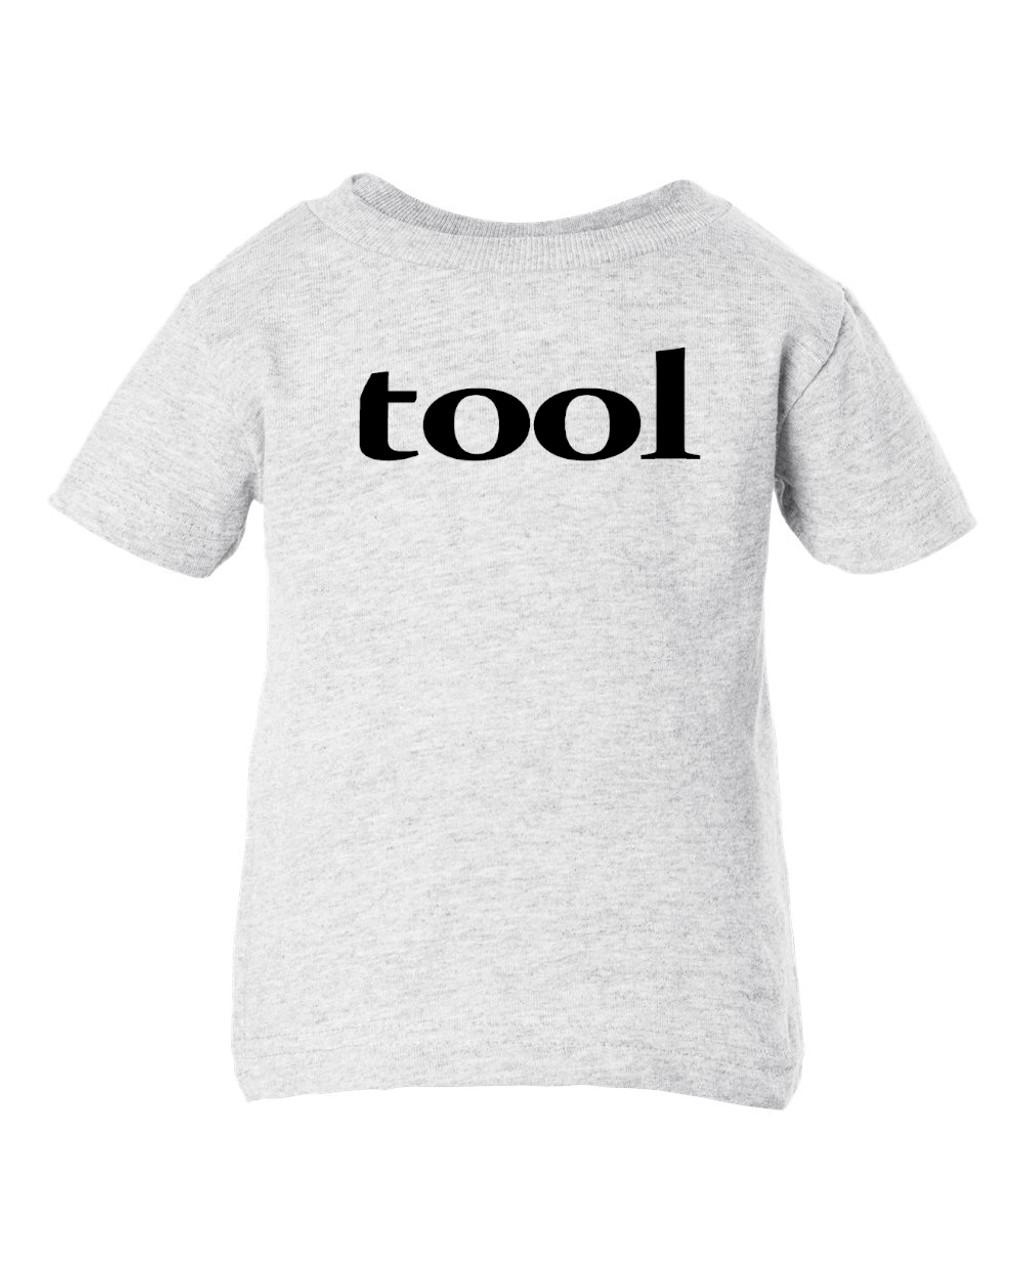 Original Design Ash Tool Tee Tribute Concert Baby & Toddler T-Shirt